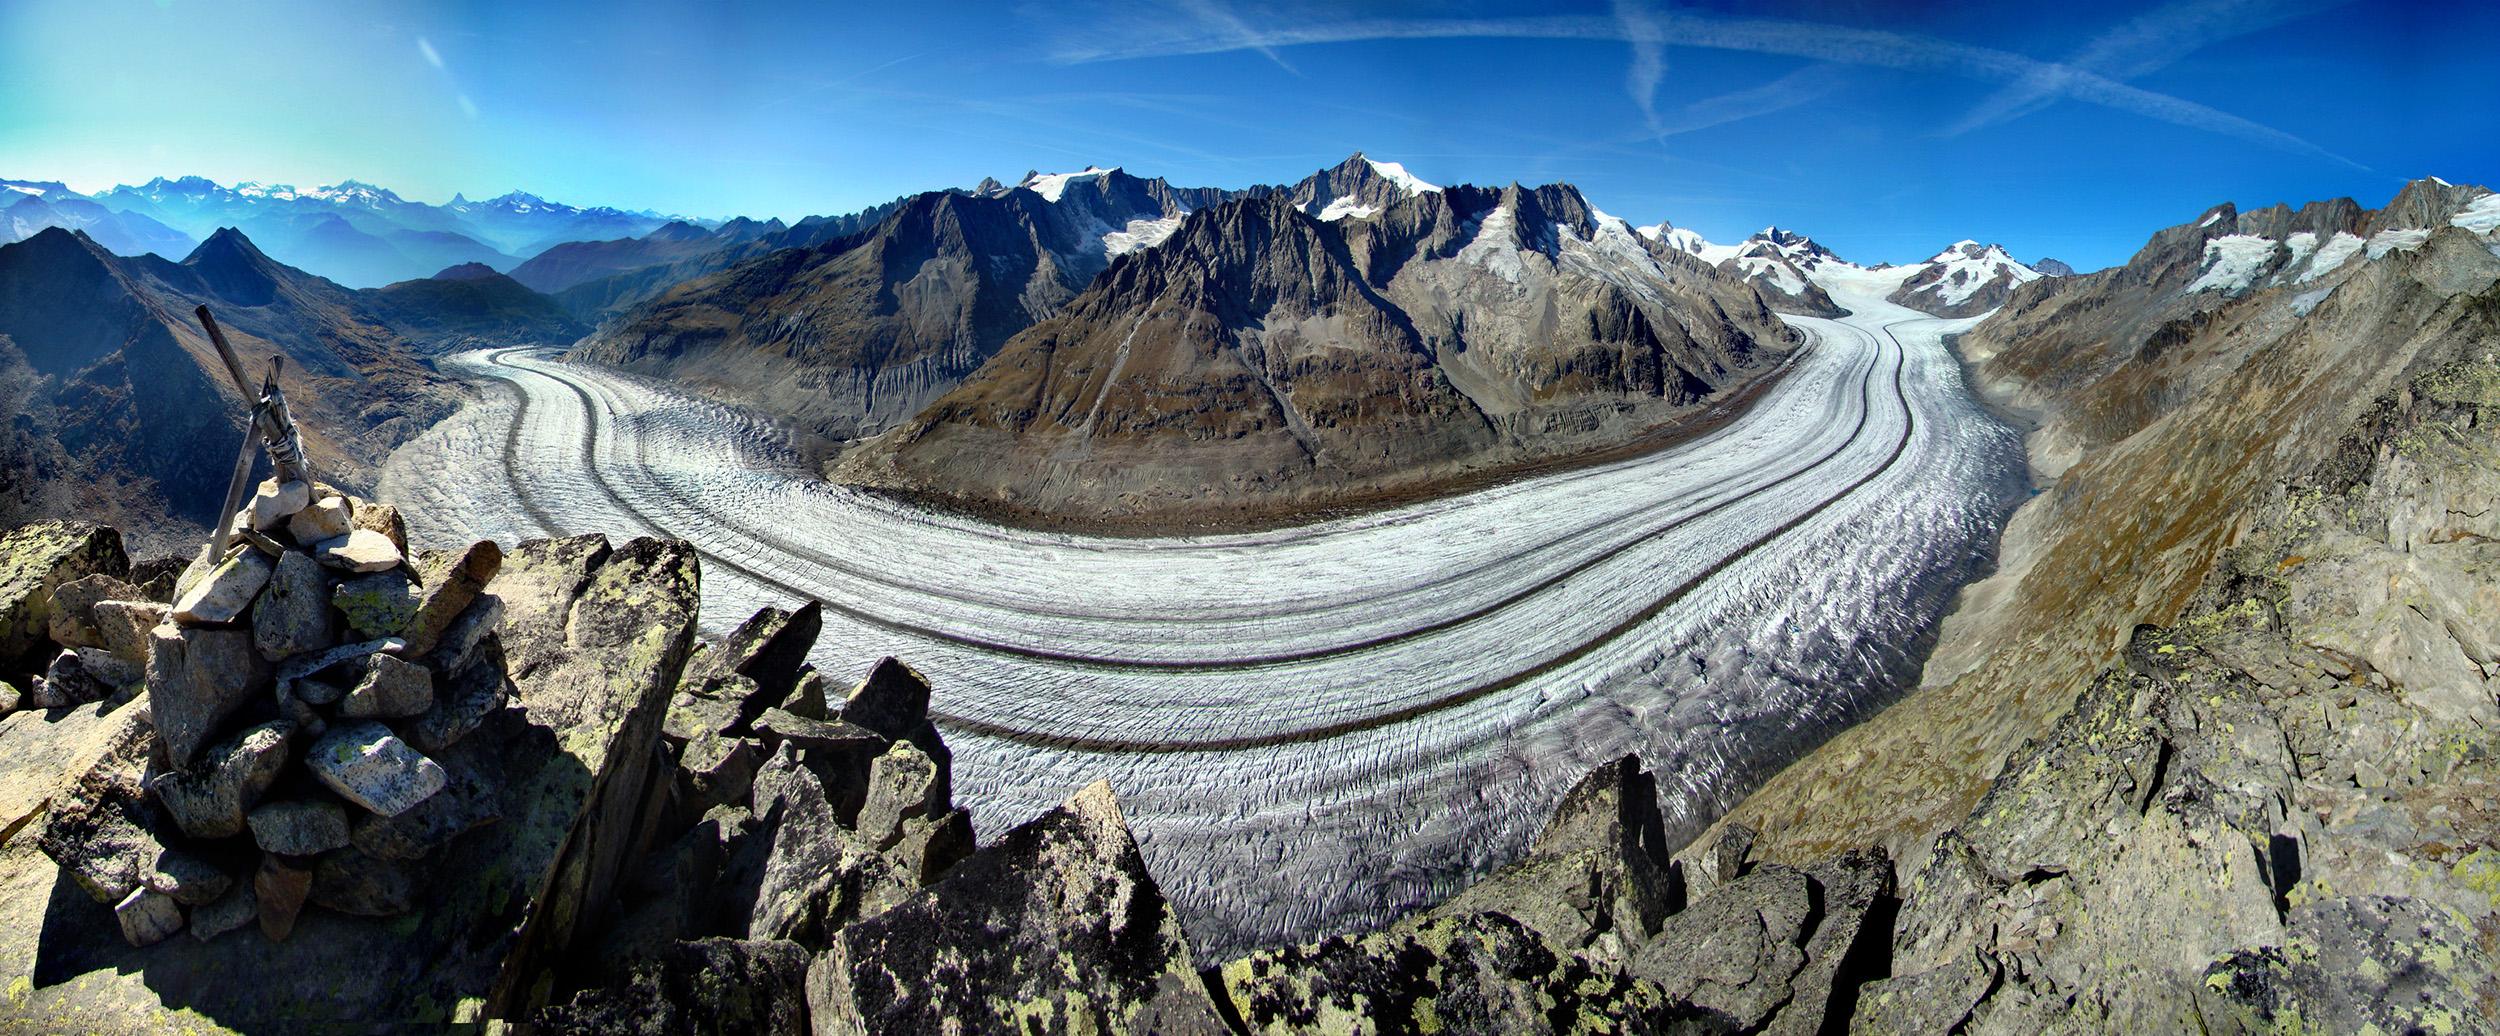 ghiacciaio- Aletsch Arena.